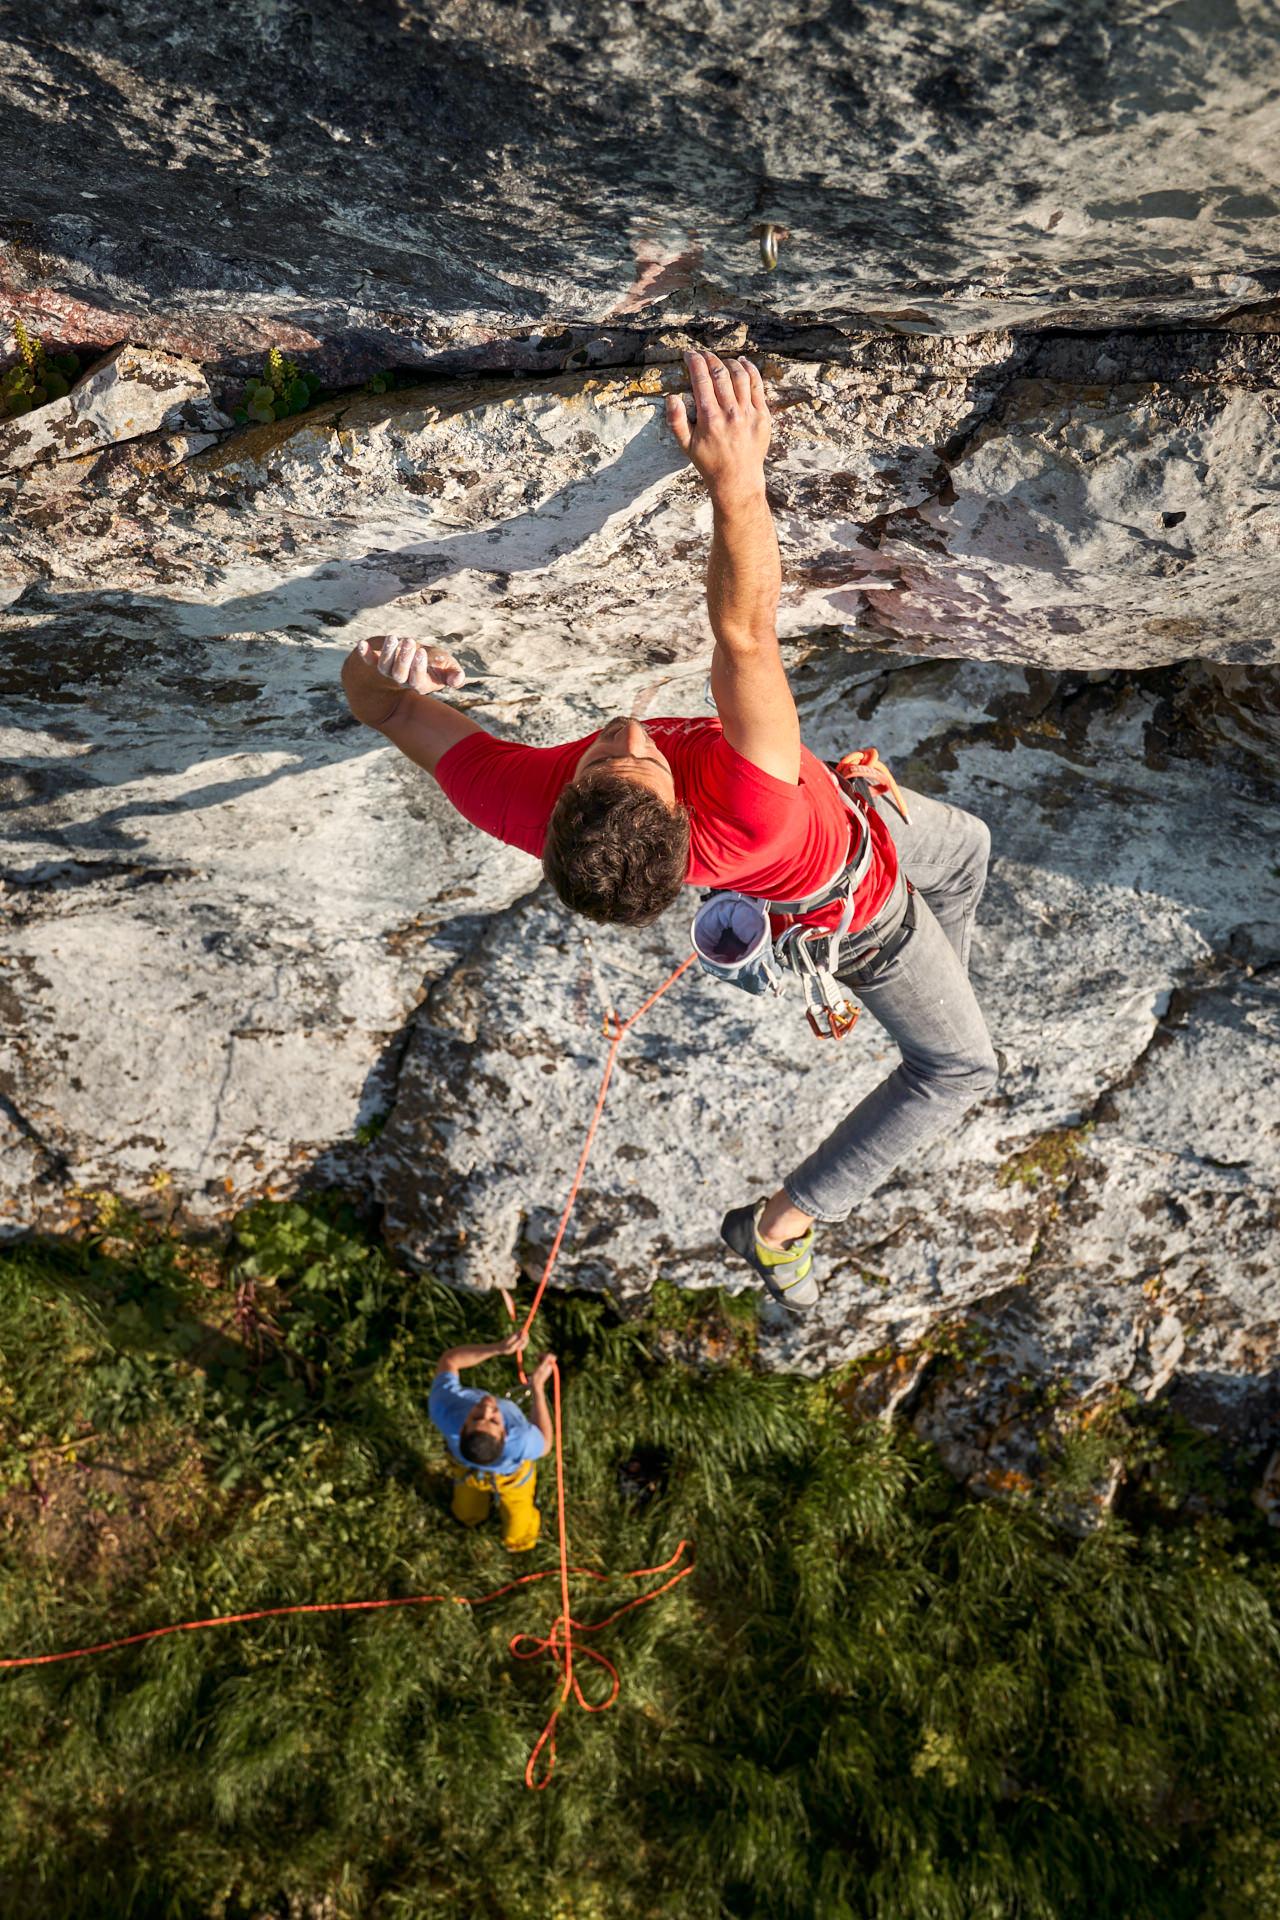 Lisbon Climbing Guide - Tiago Martins climbing Chuva Obliqua (7b) in Montejunto Novo ©Martim Vidigal